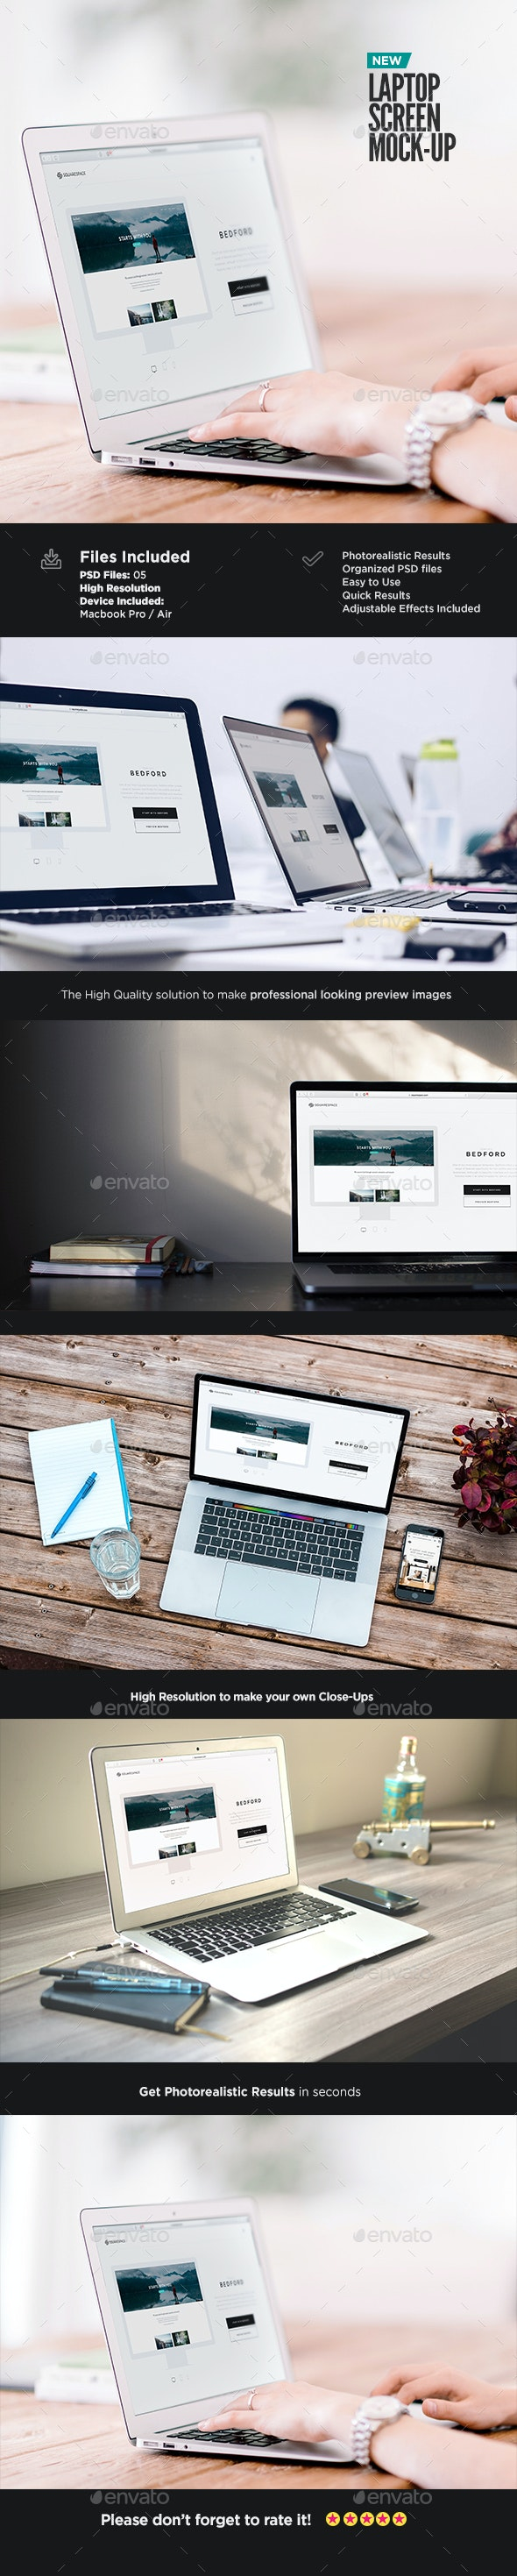 Laptop Screen Mock-up - Laptop Displays